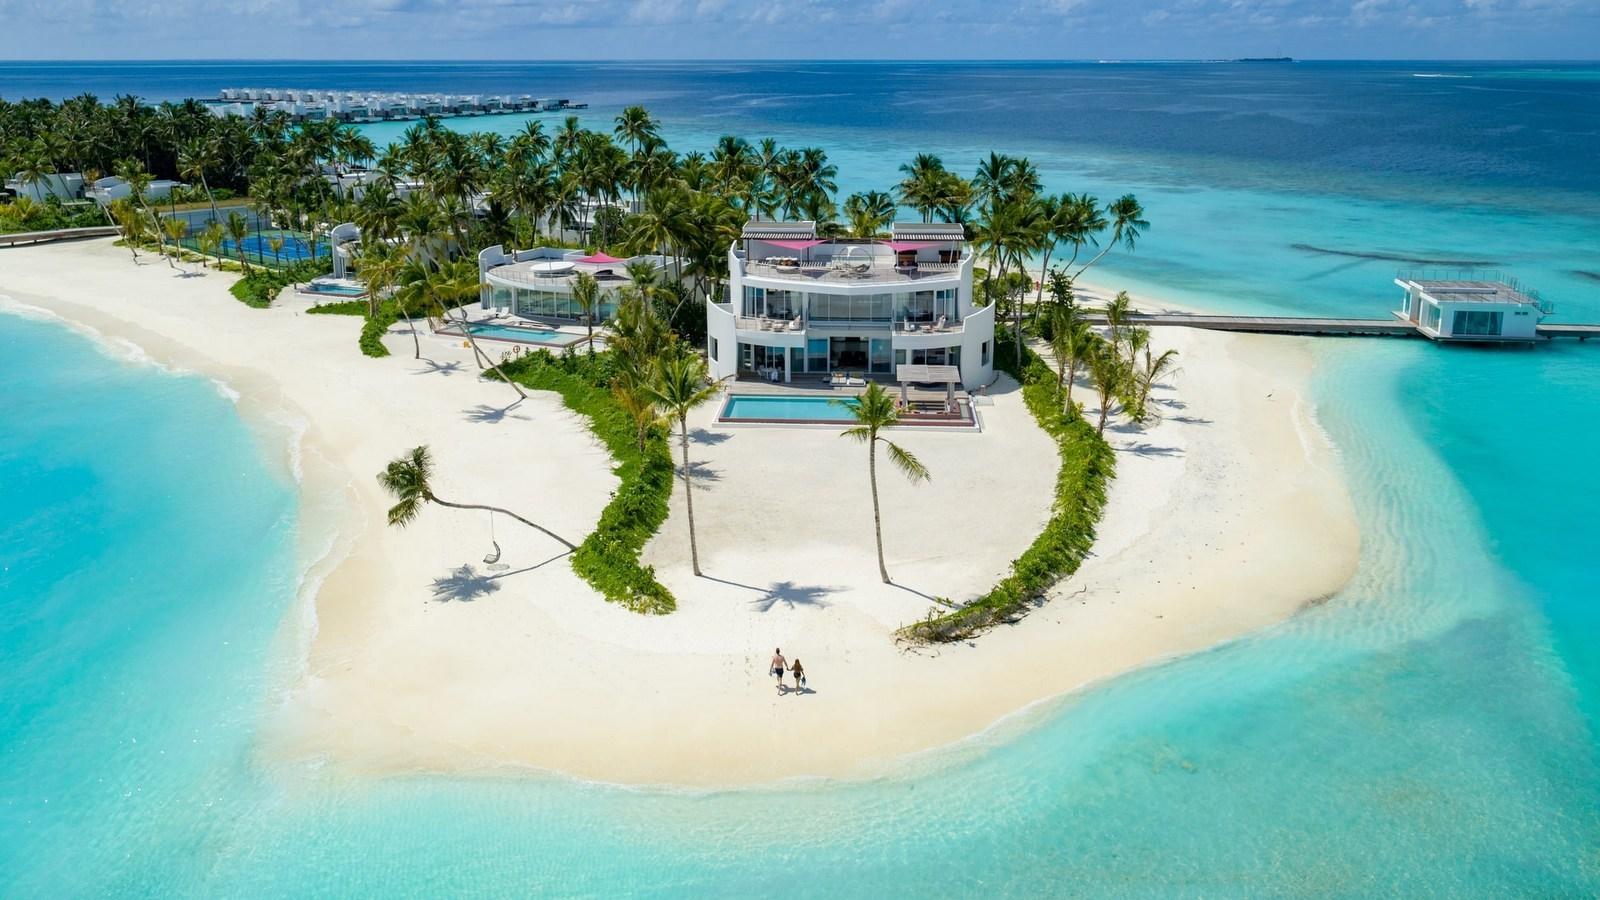 Мальдивы, отель LUX North Male Atoll, номер LUX Beach Retreat 3 Bedroom